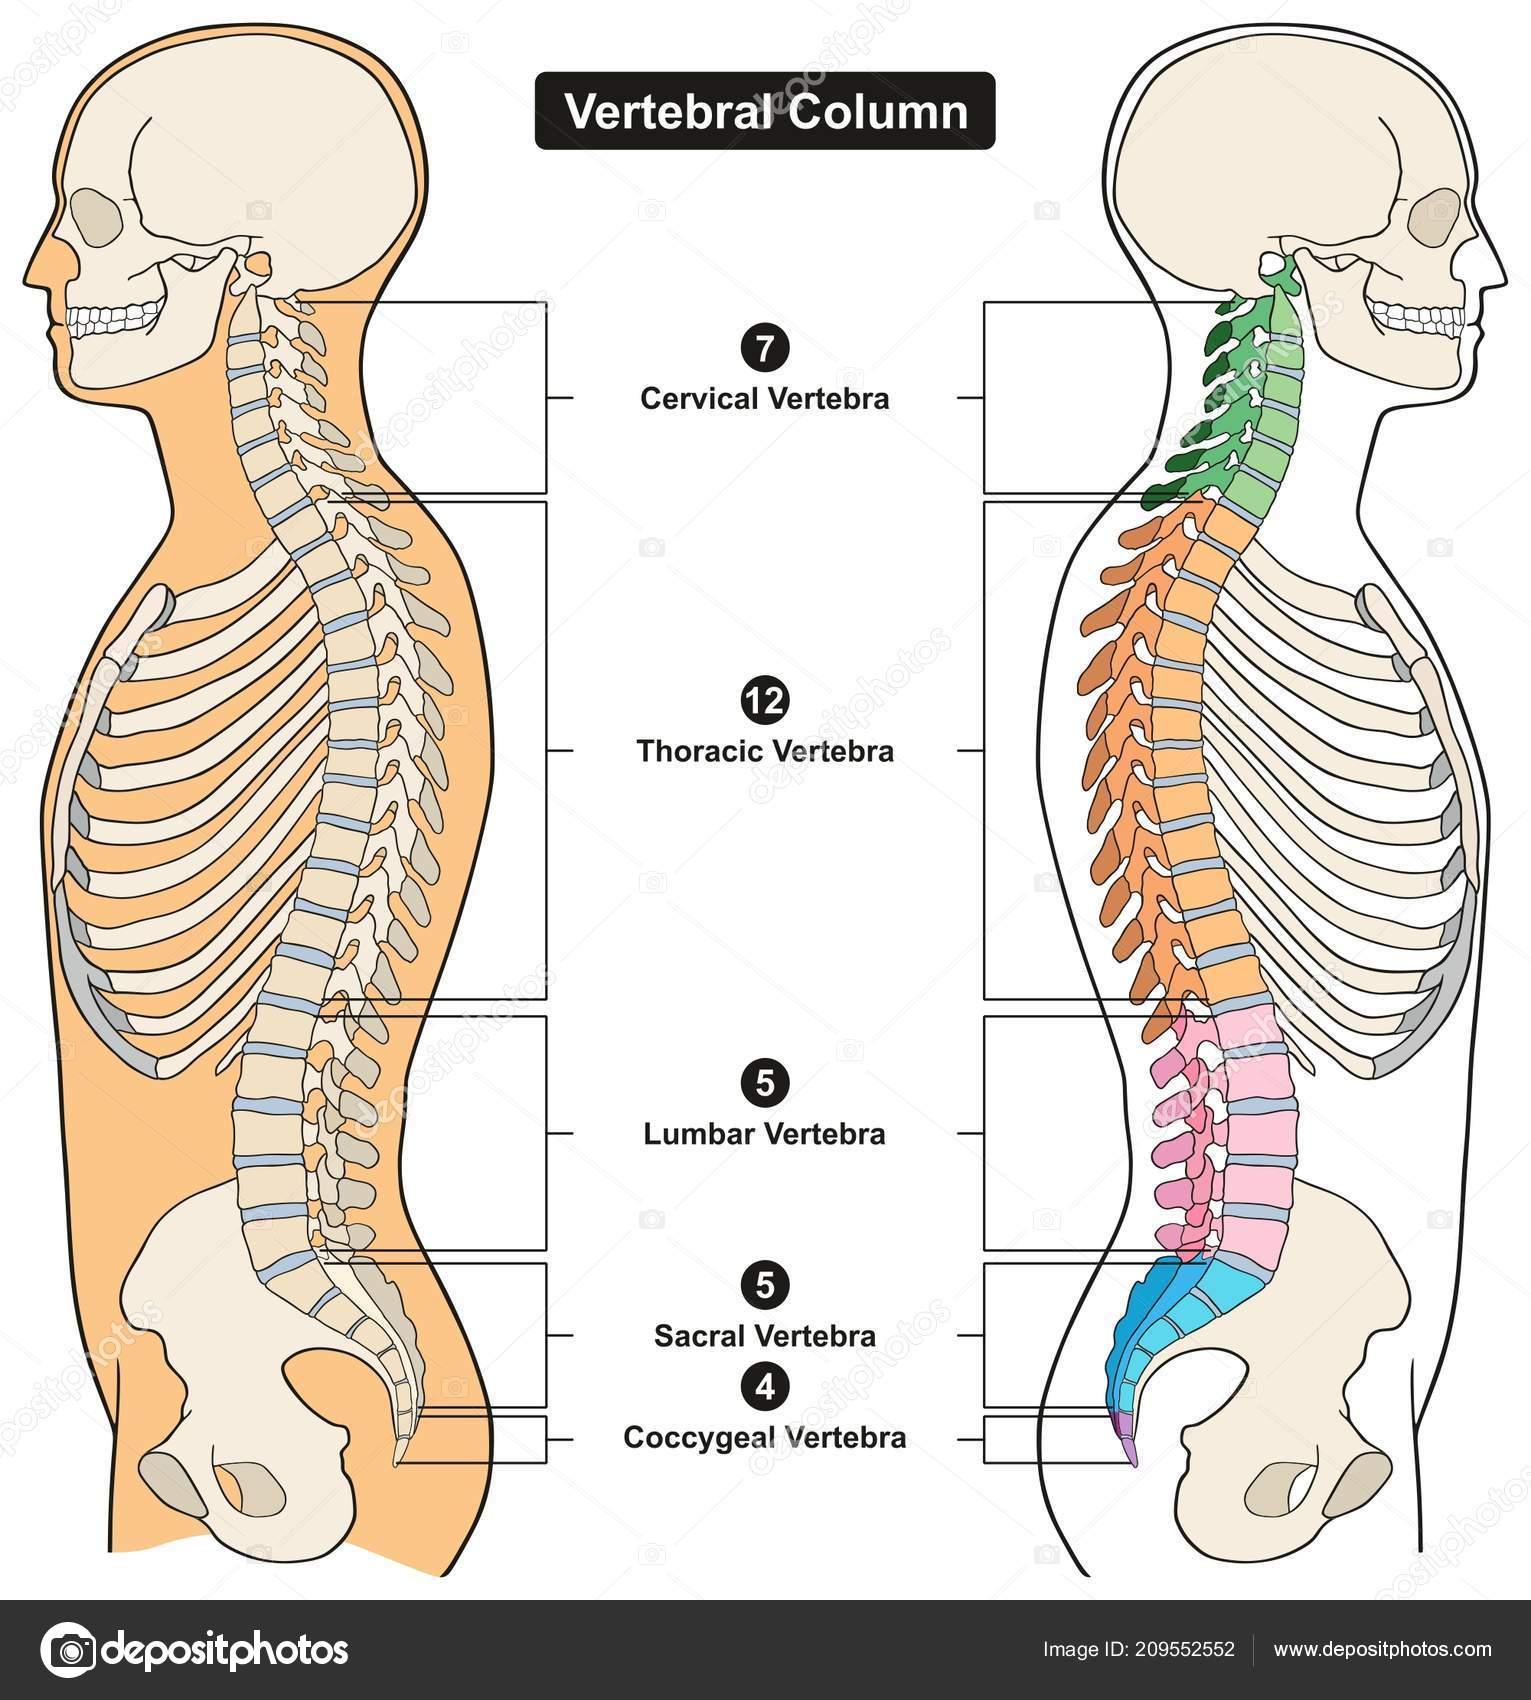 Vertebral Column Human Body Anatomy Infograpic Diagram Including All ...